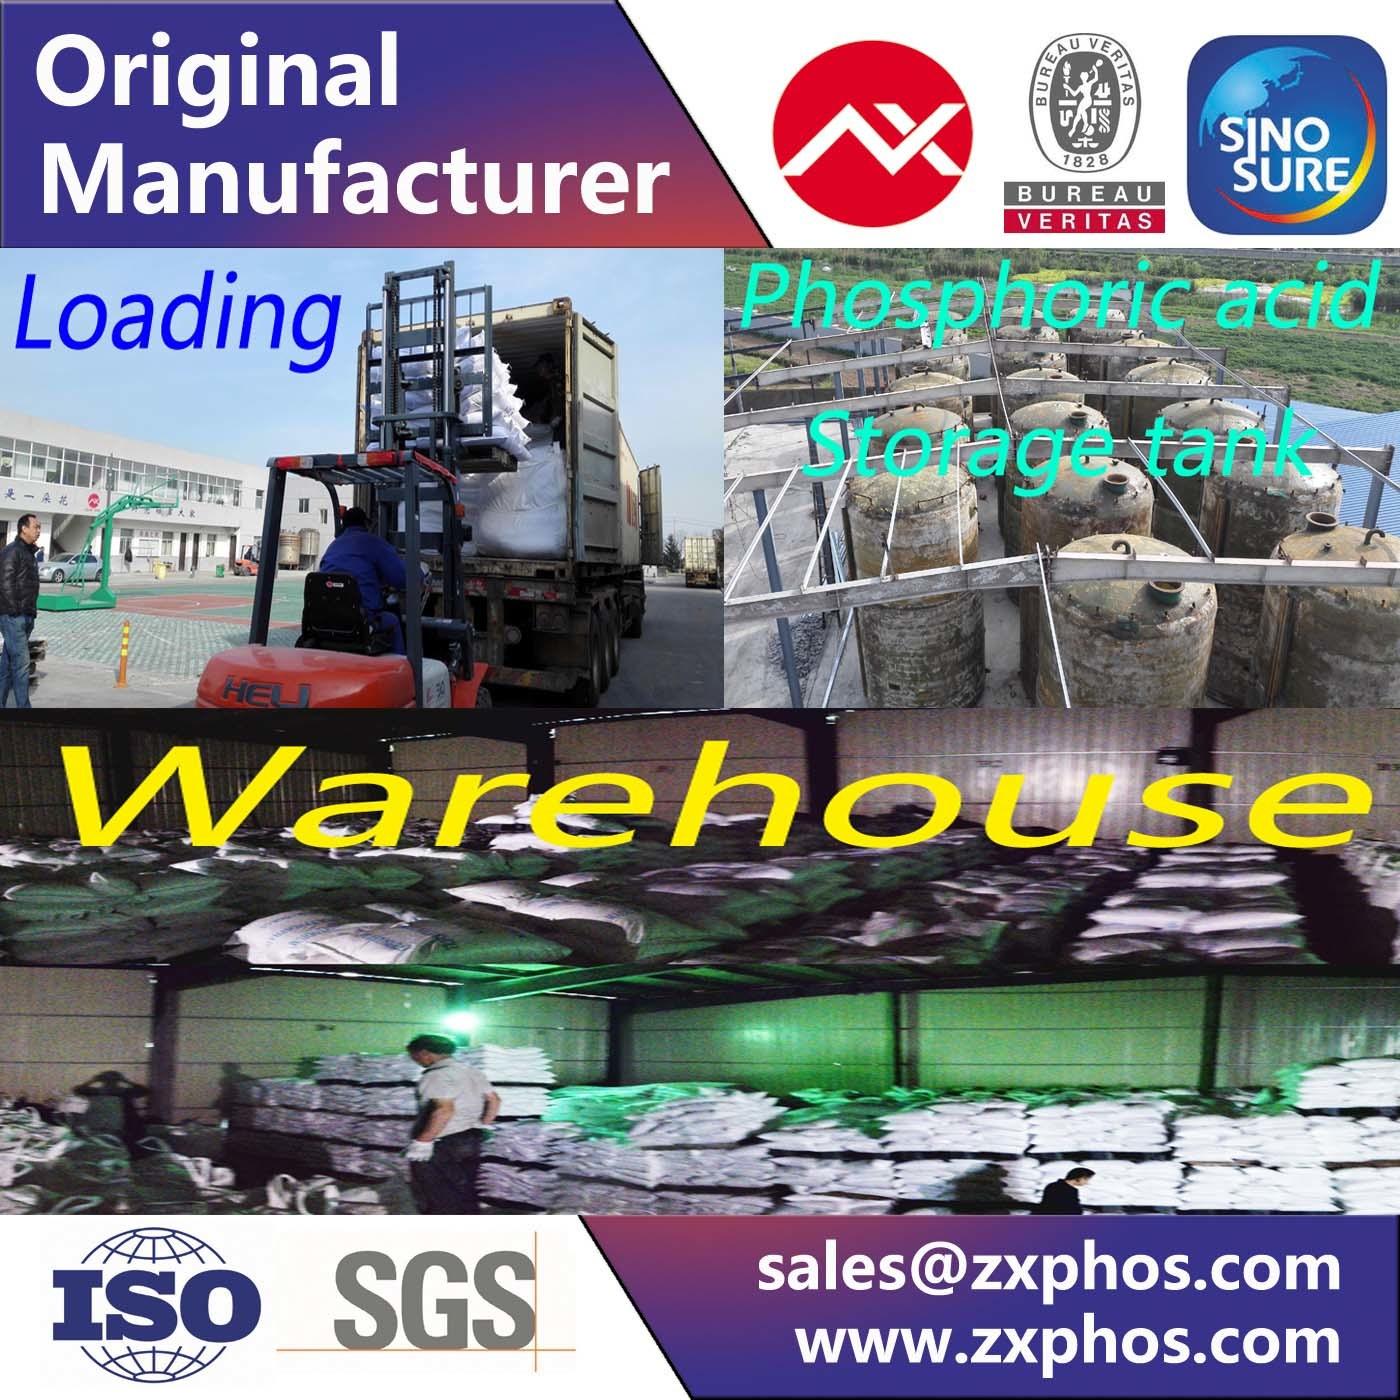 SHMP - Sodium Hexametaphosphate - Technical Grade - 68% Content SHMP - Industrial Grade